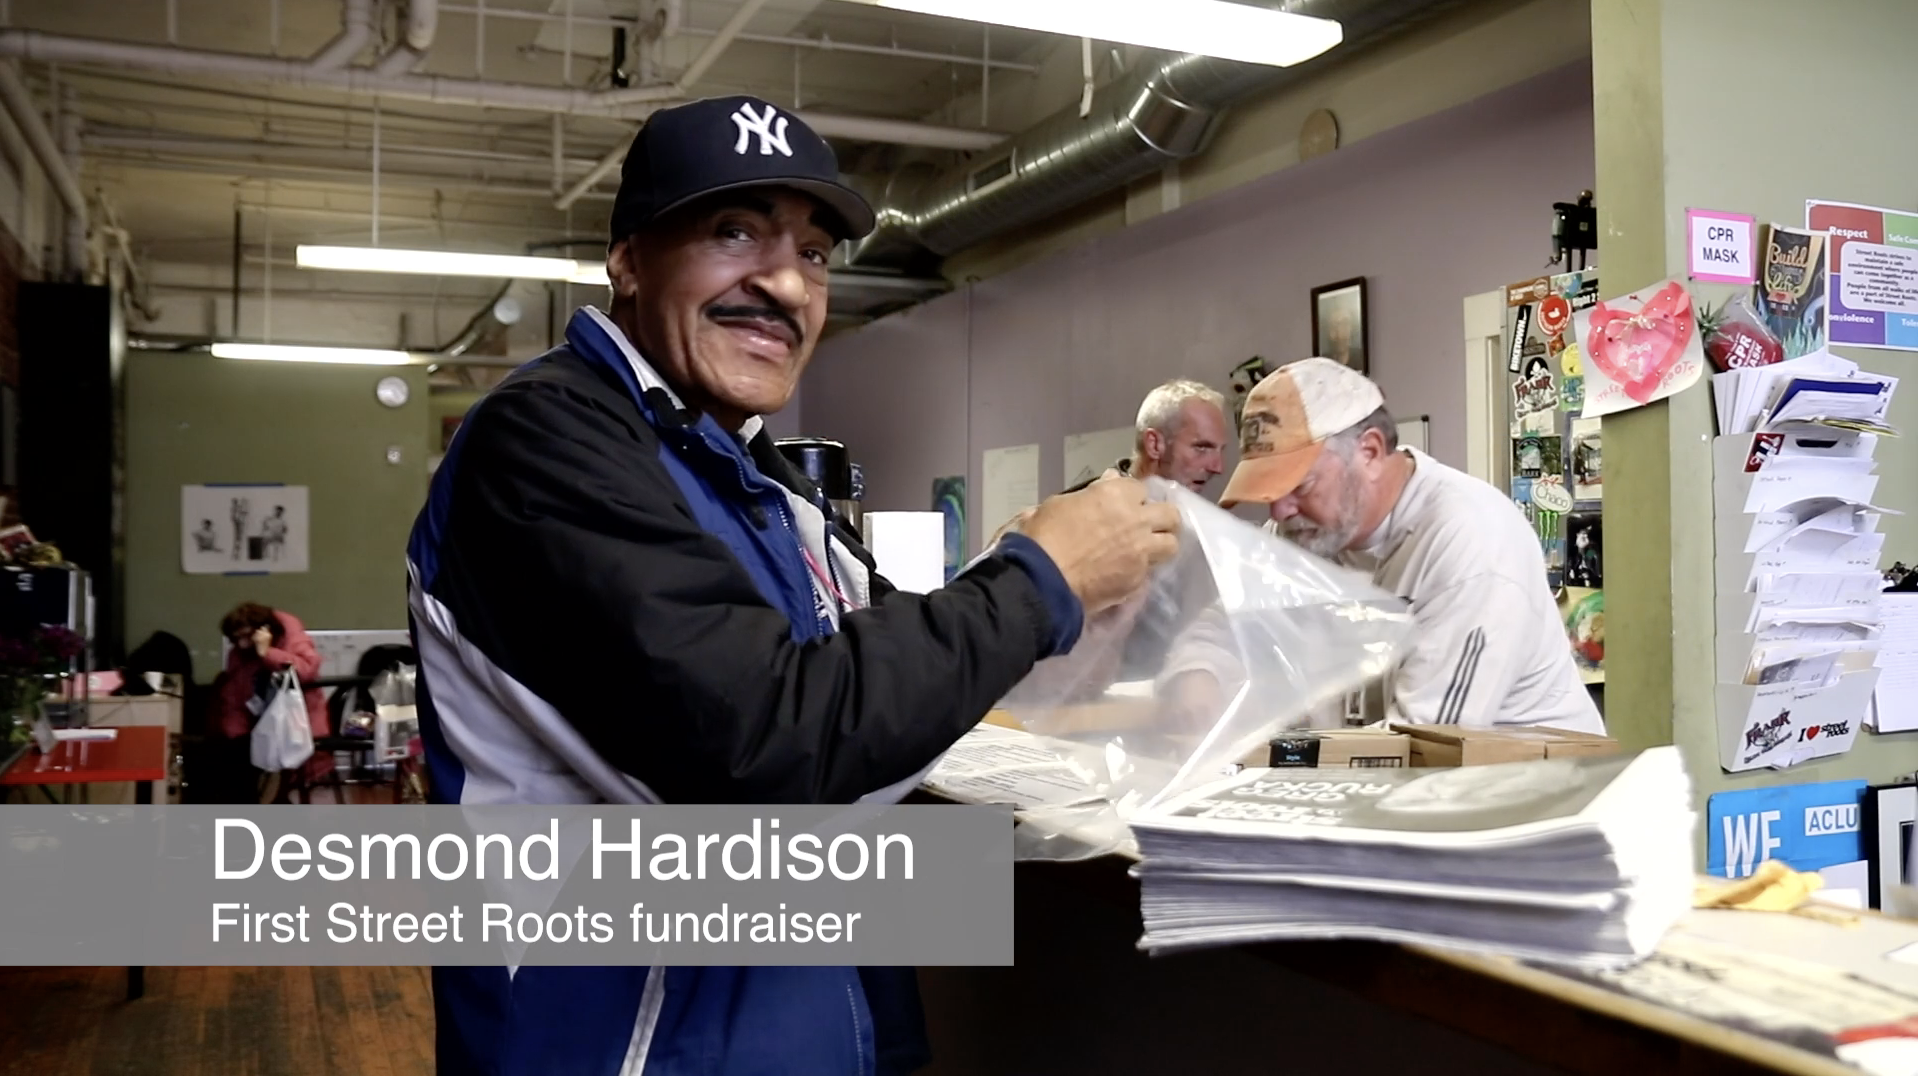 Desmond Hardison